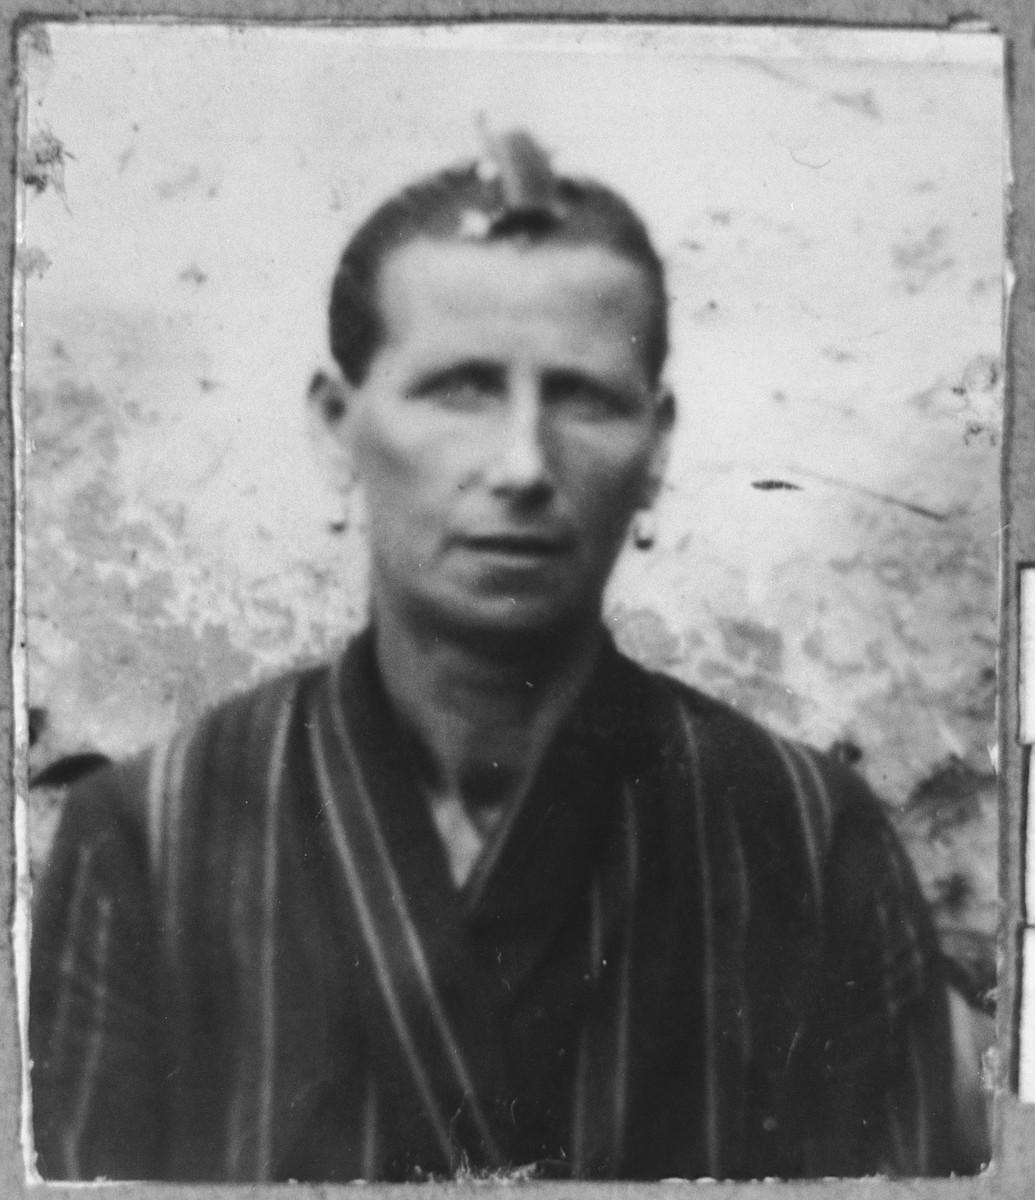 Portrait of Yochevet (Y.) Levi.  She was a laundress.  She lived at Novatska 5 in Bitola.